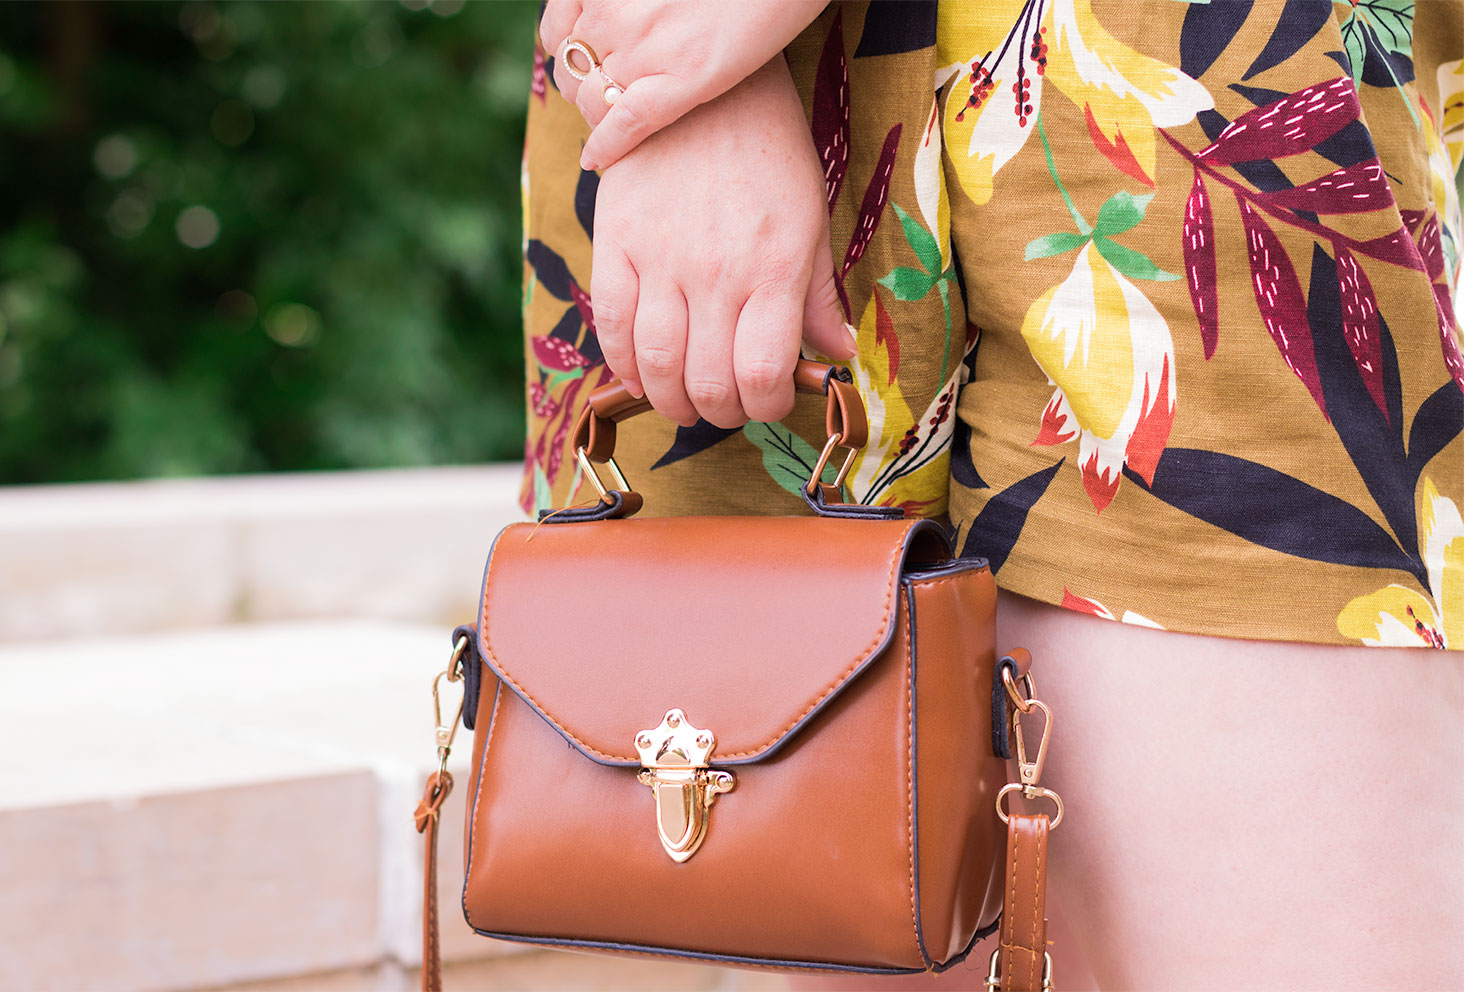 Zoom sac camel Shein, tenu dans la main devant un short à fleurs Zara